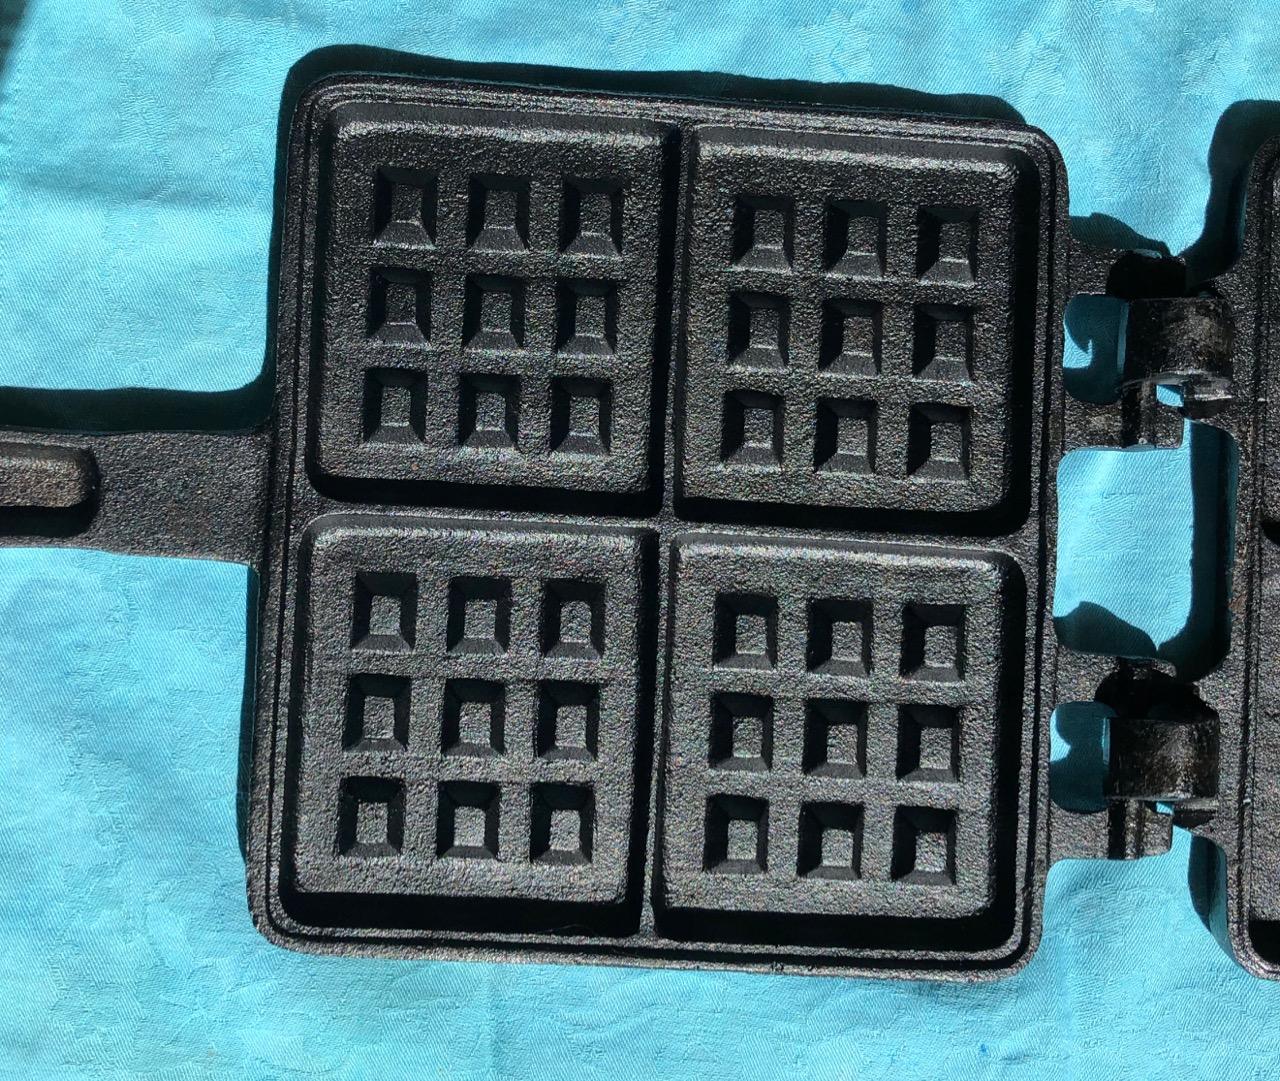 Pre-seasoned waffle maker